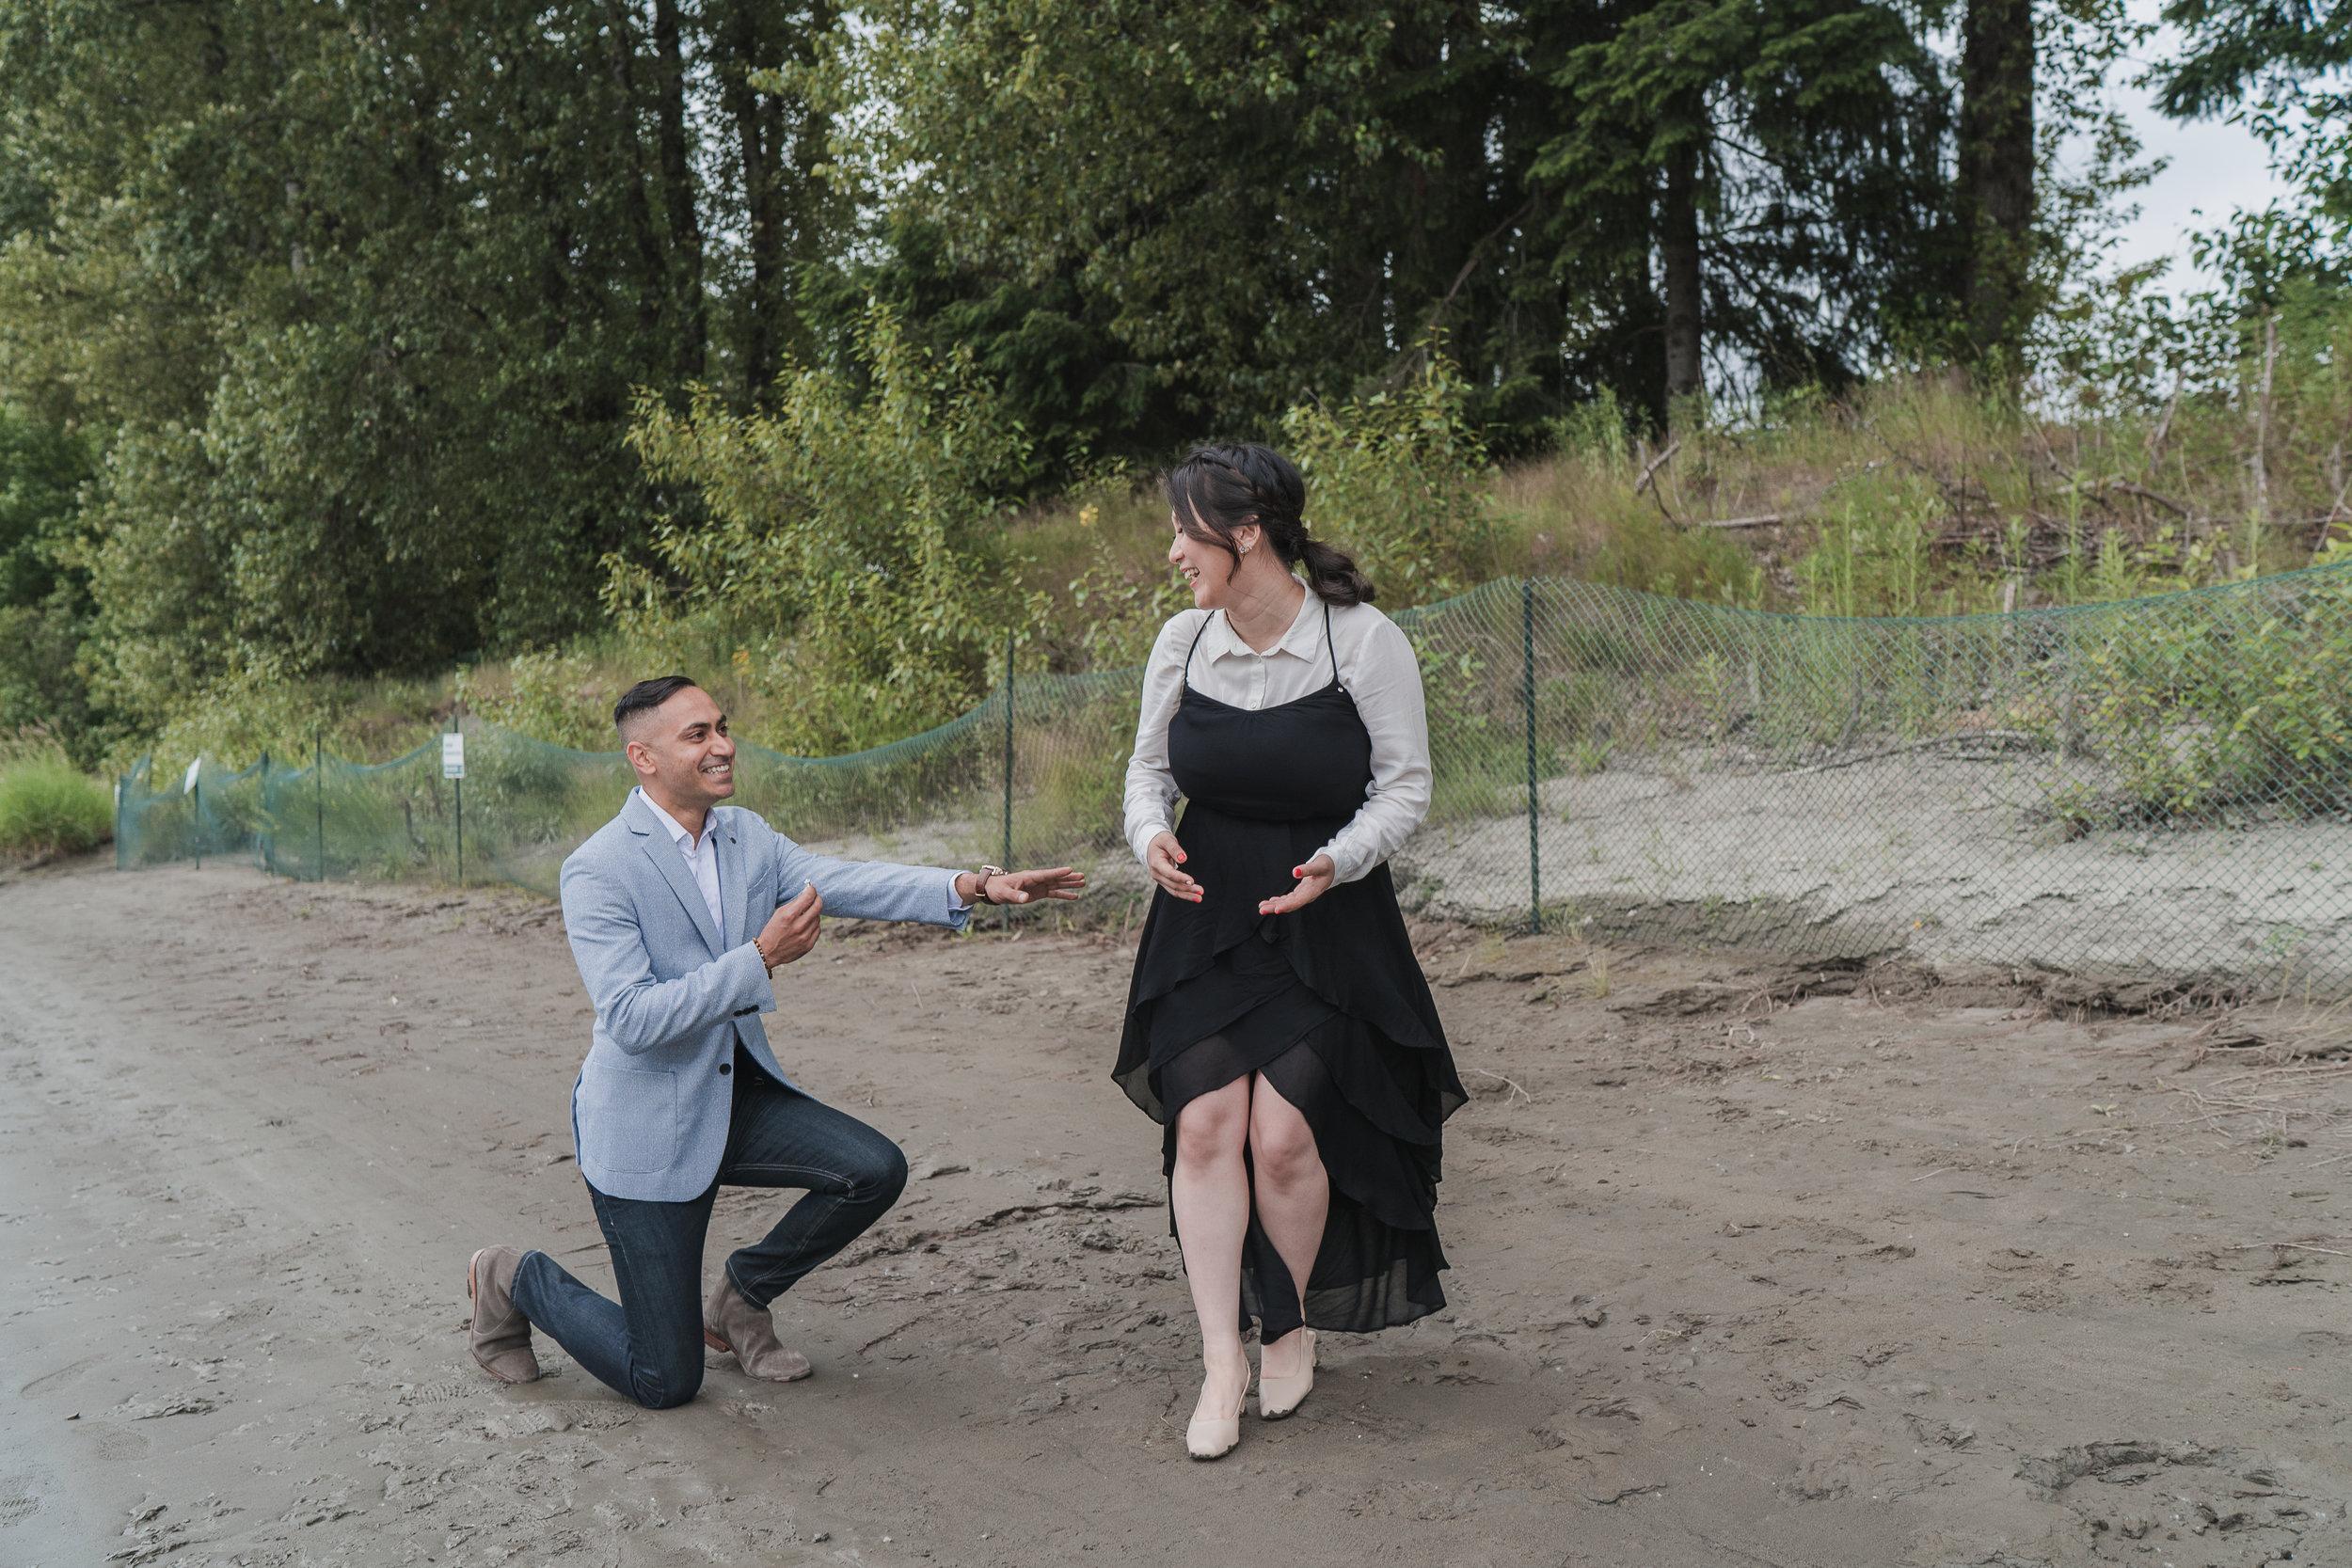 20190622 - Monika & Johnson Engagement- 0027.jpg